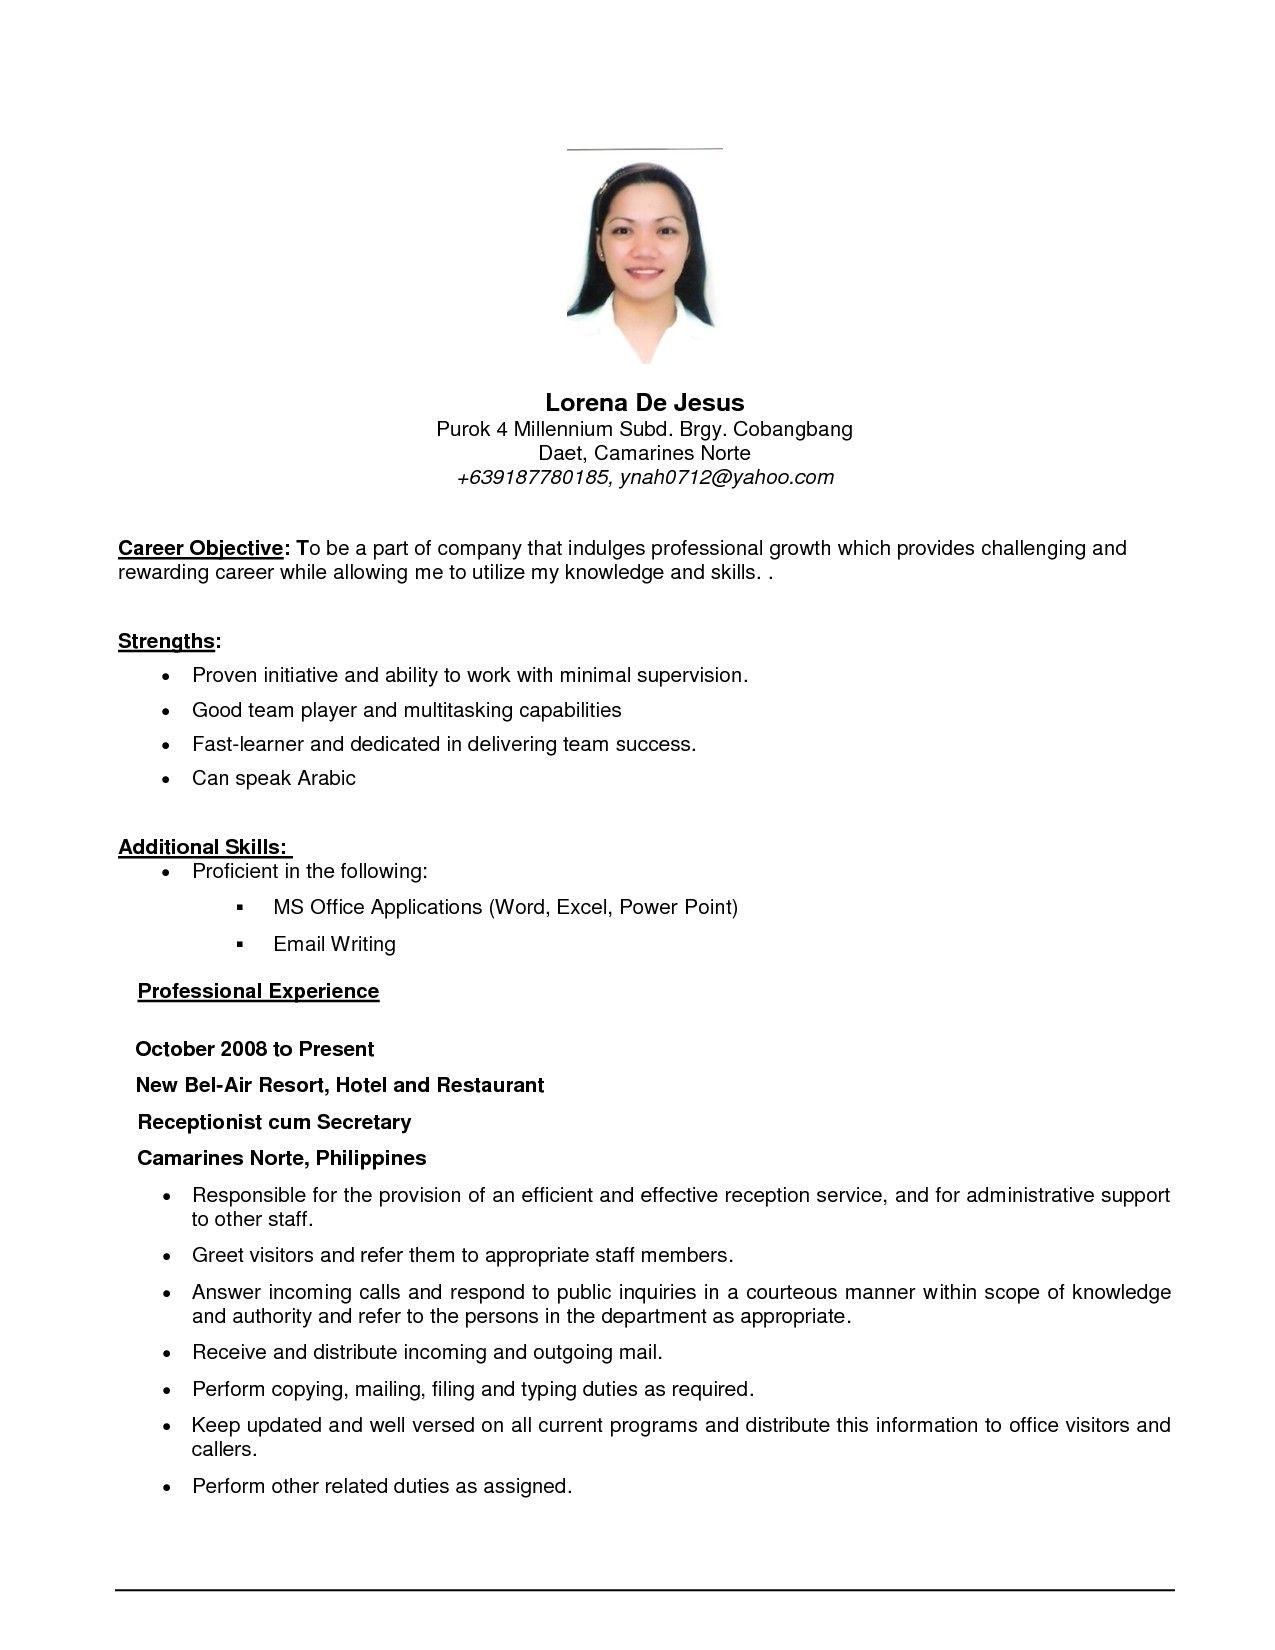 first job resume job objectiveml